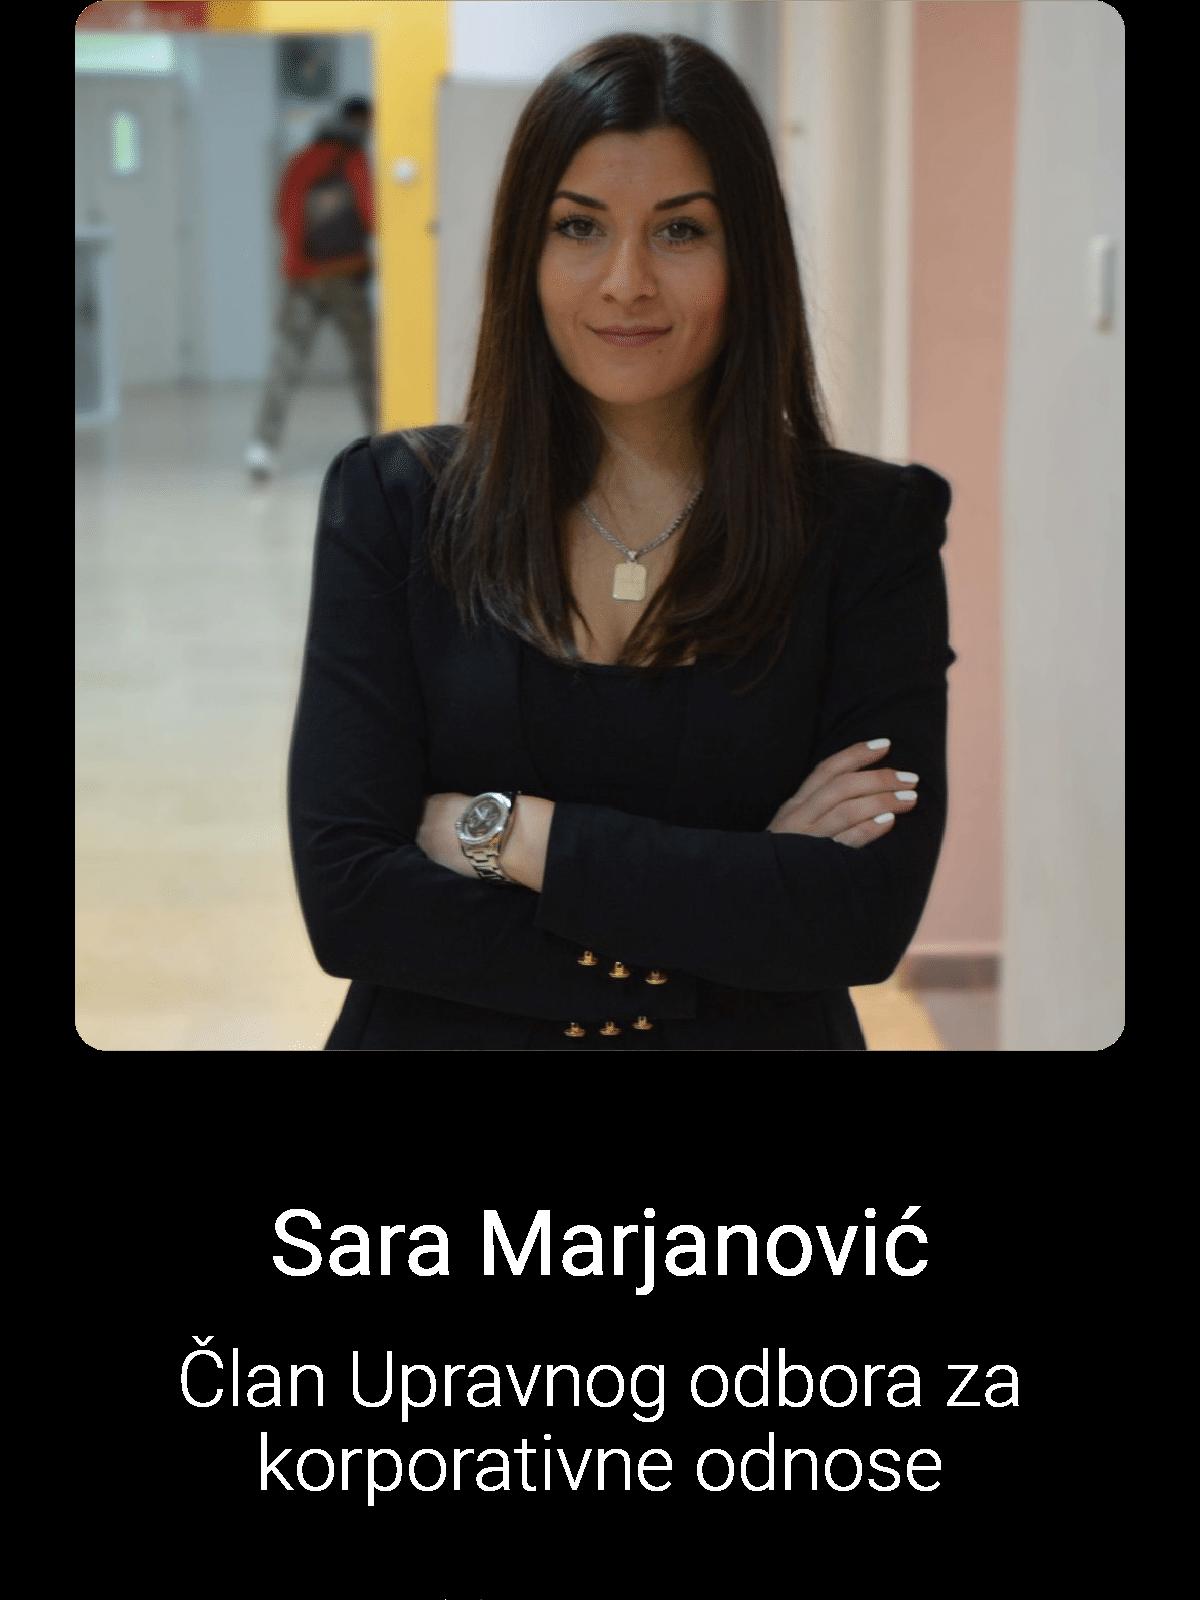 Sara Marjanović